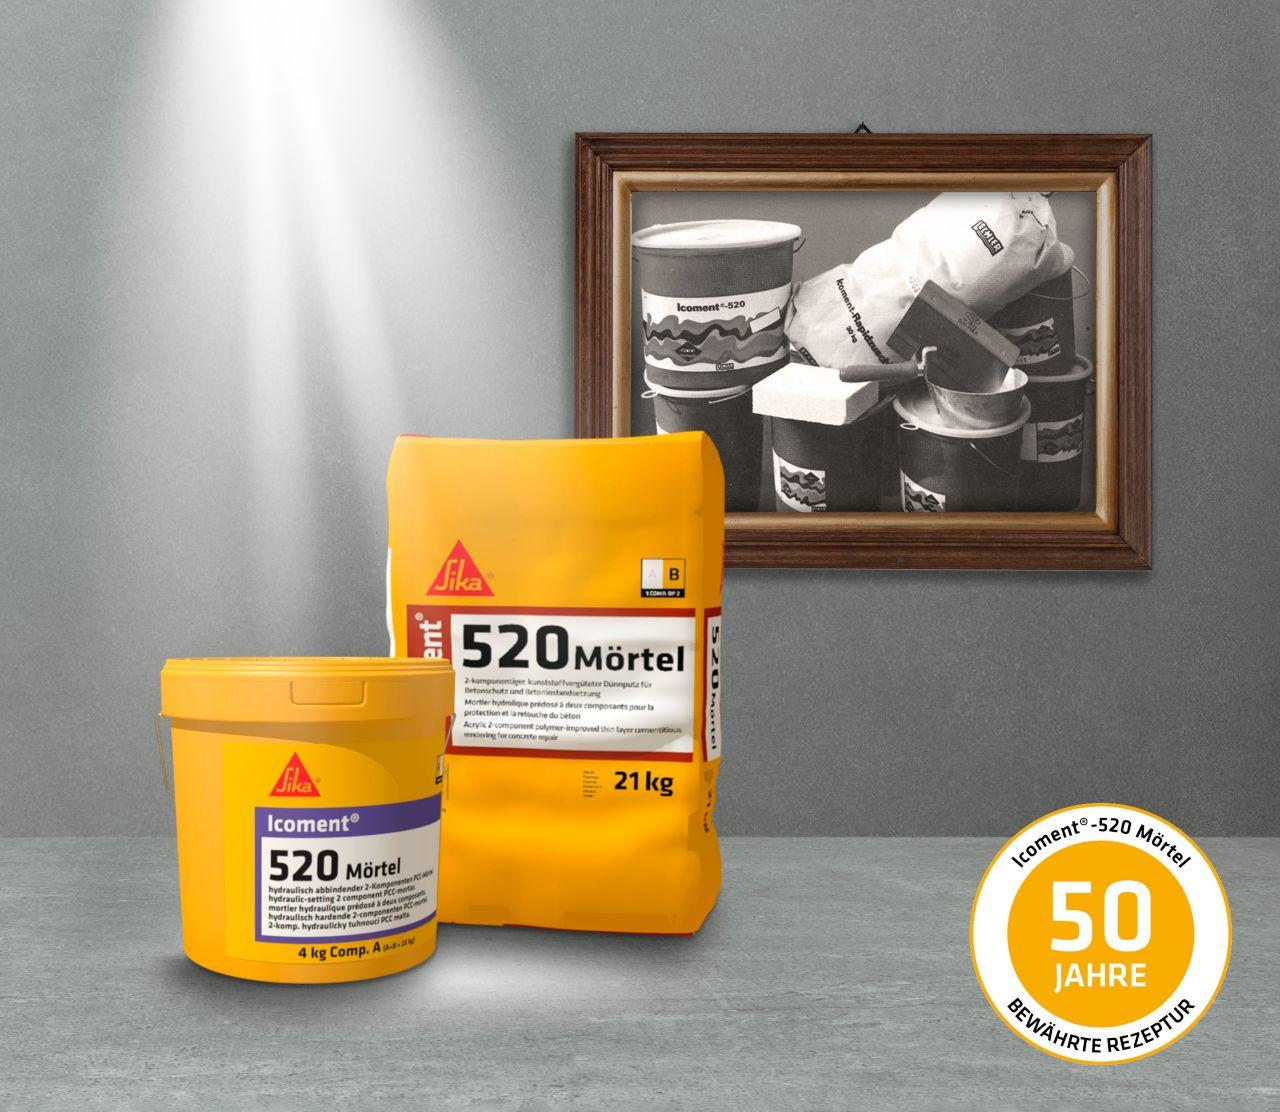 Refurbishment: Icoment-520 Mörtel - 50 Jahre